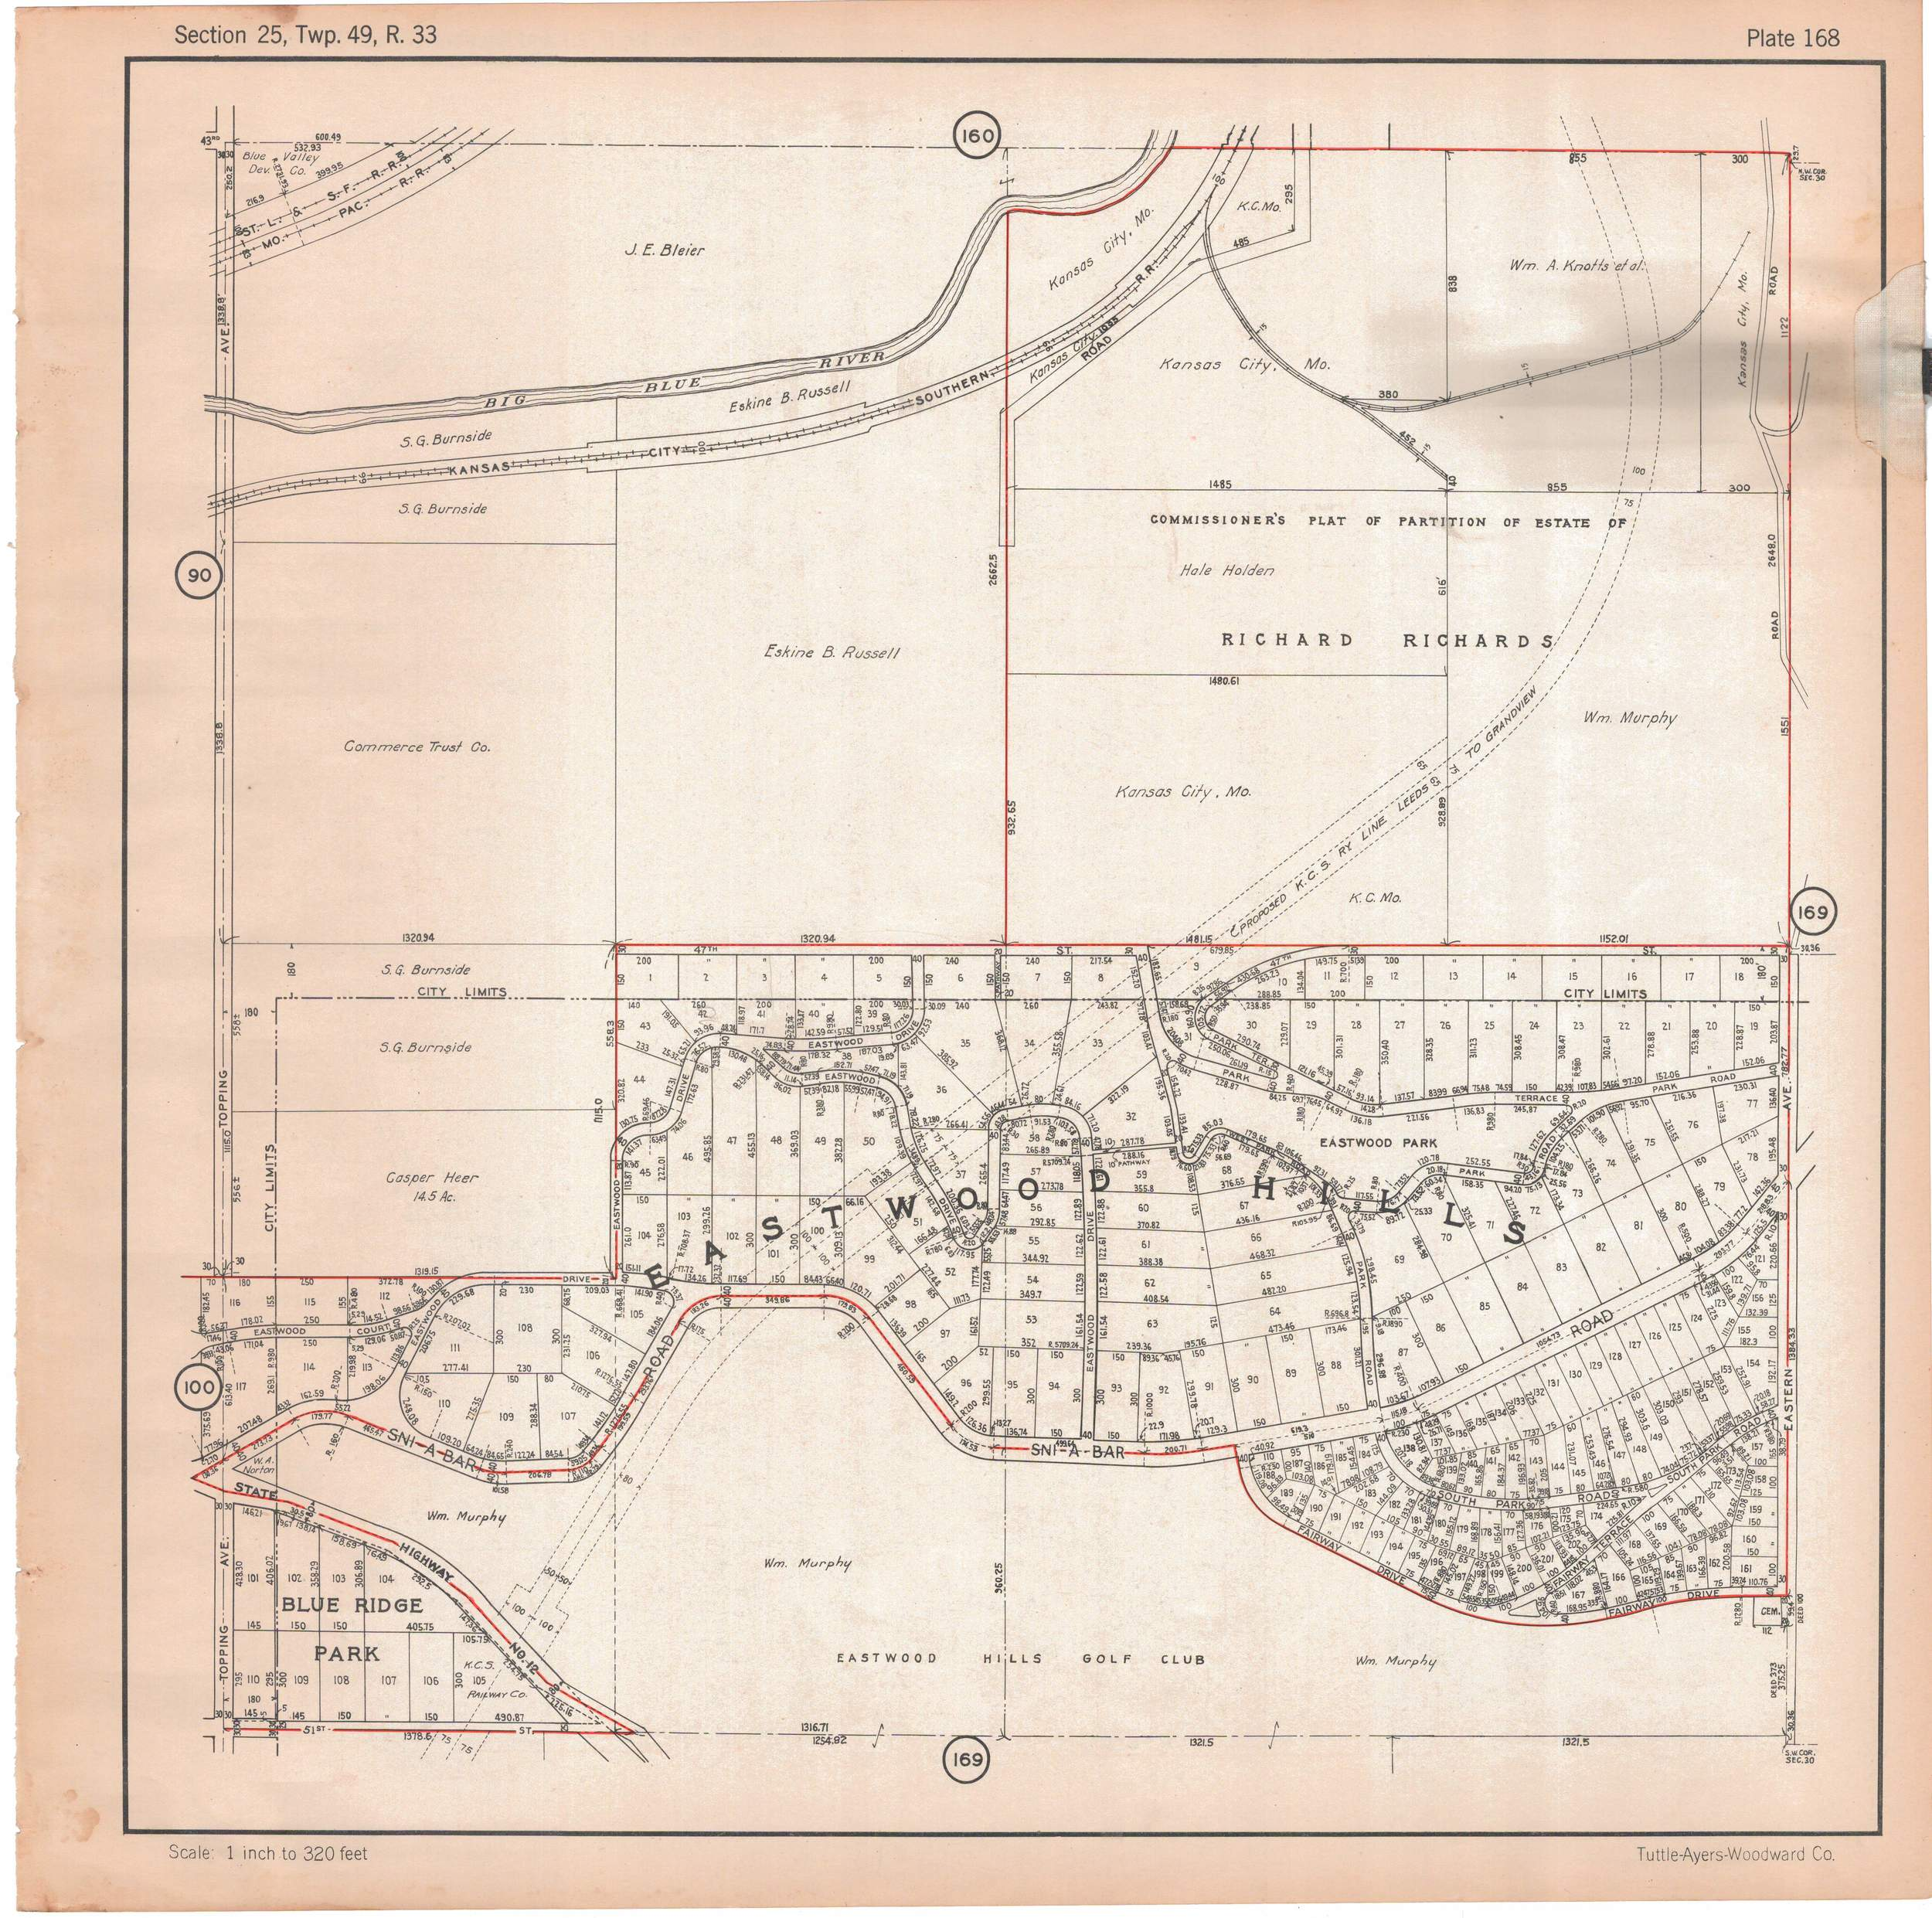 1925 TUTTLE_AYERS_Plate_168.JPG